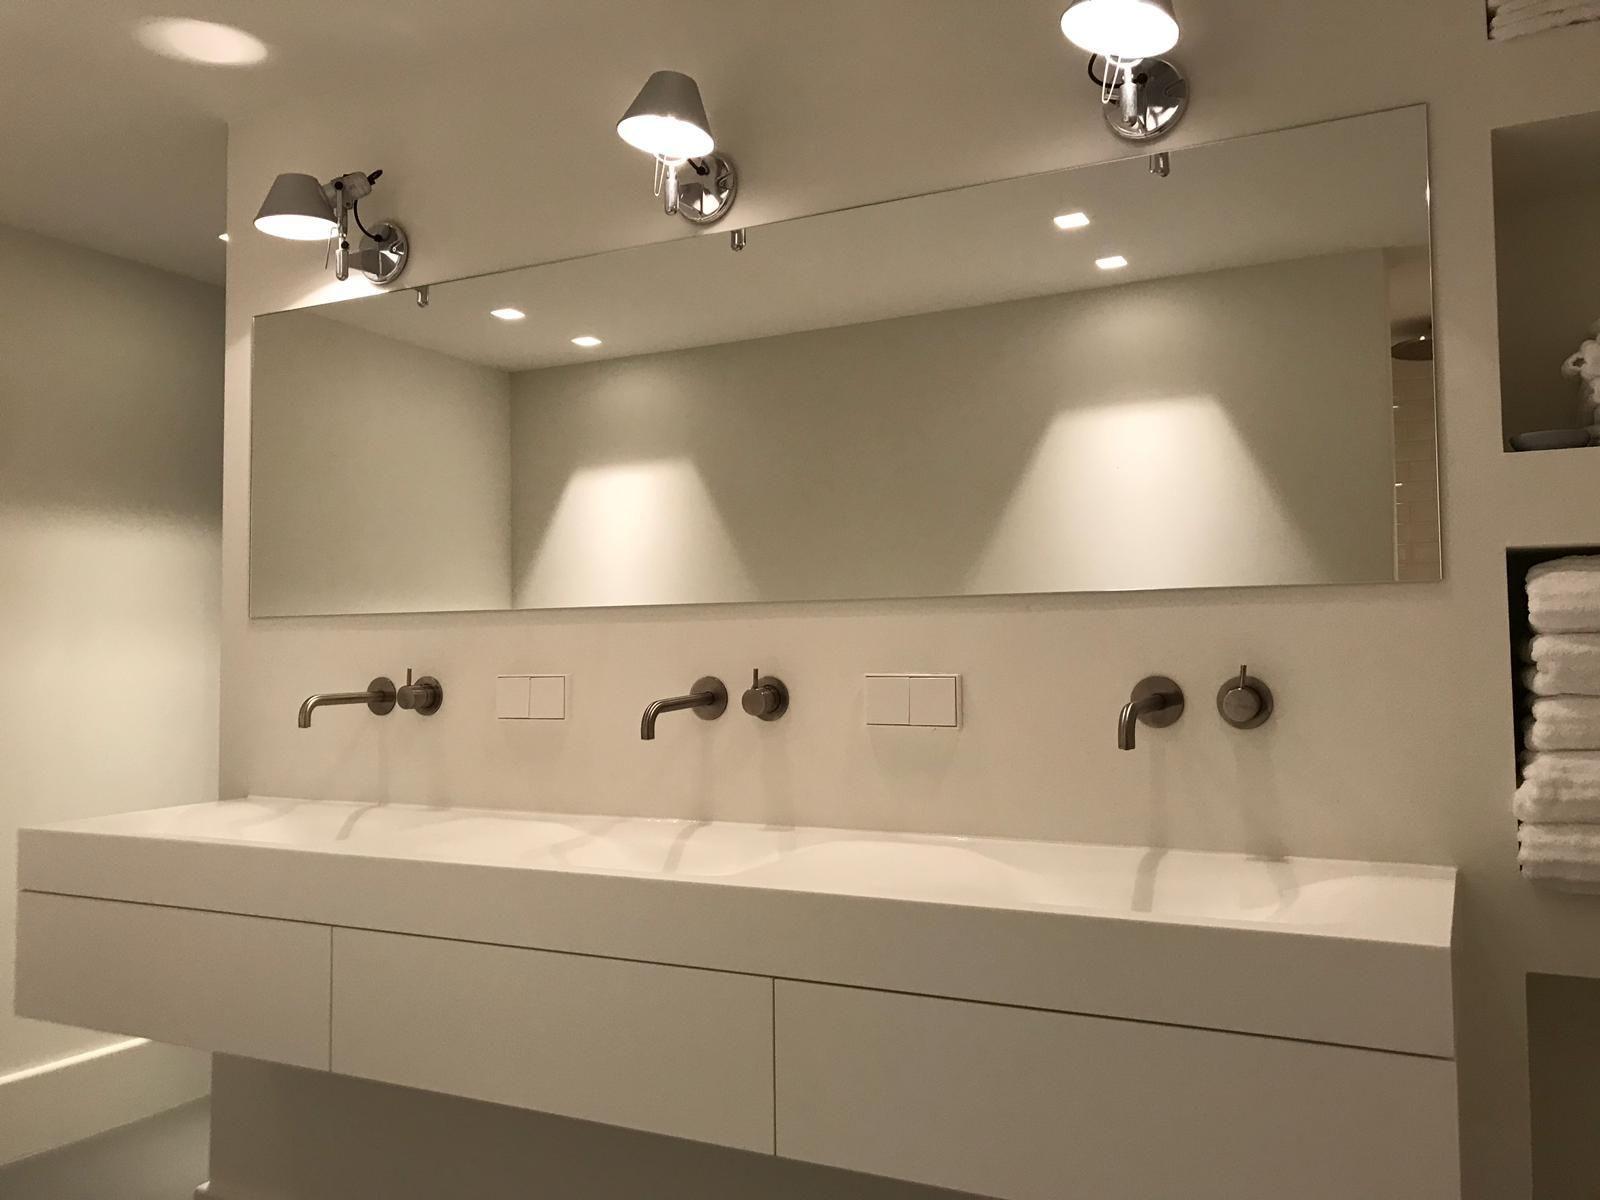 Tiz Design Kwaliteits Badkamermeubels Solid Surface Badkamer Inspiratie Badkamermeubels Spiegel Badkamer